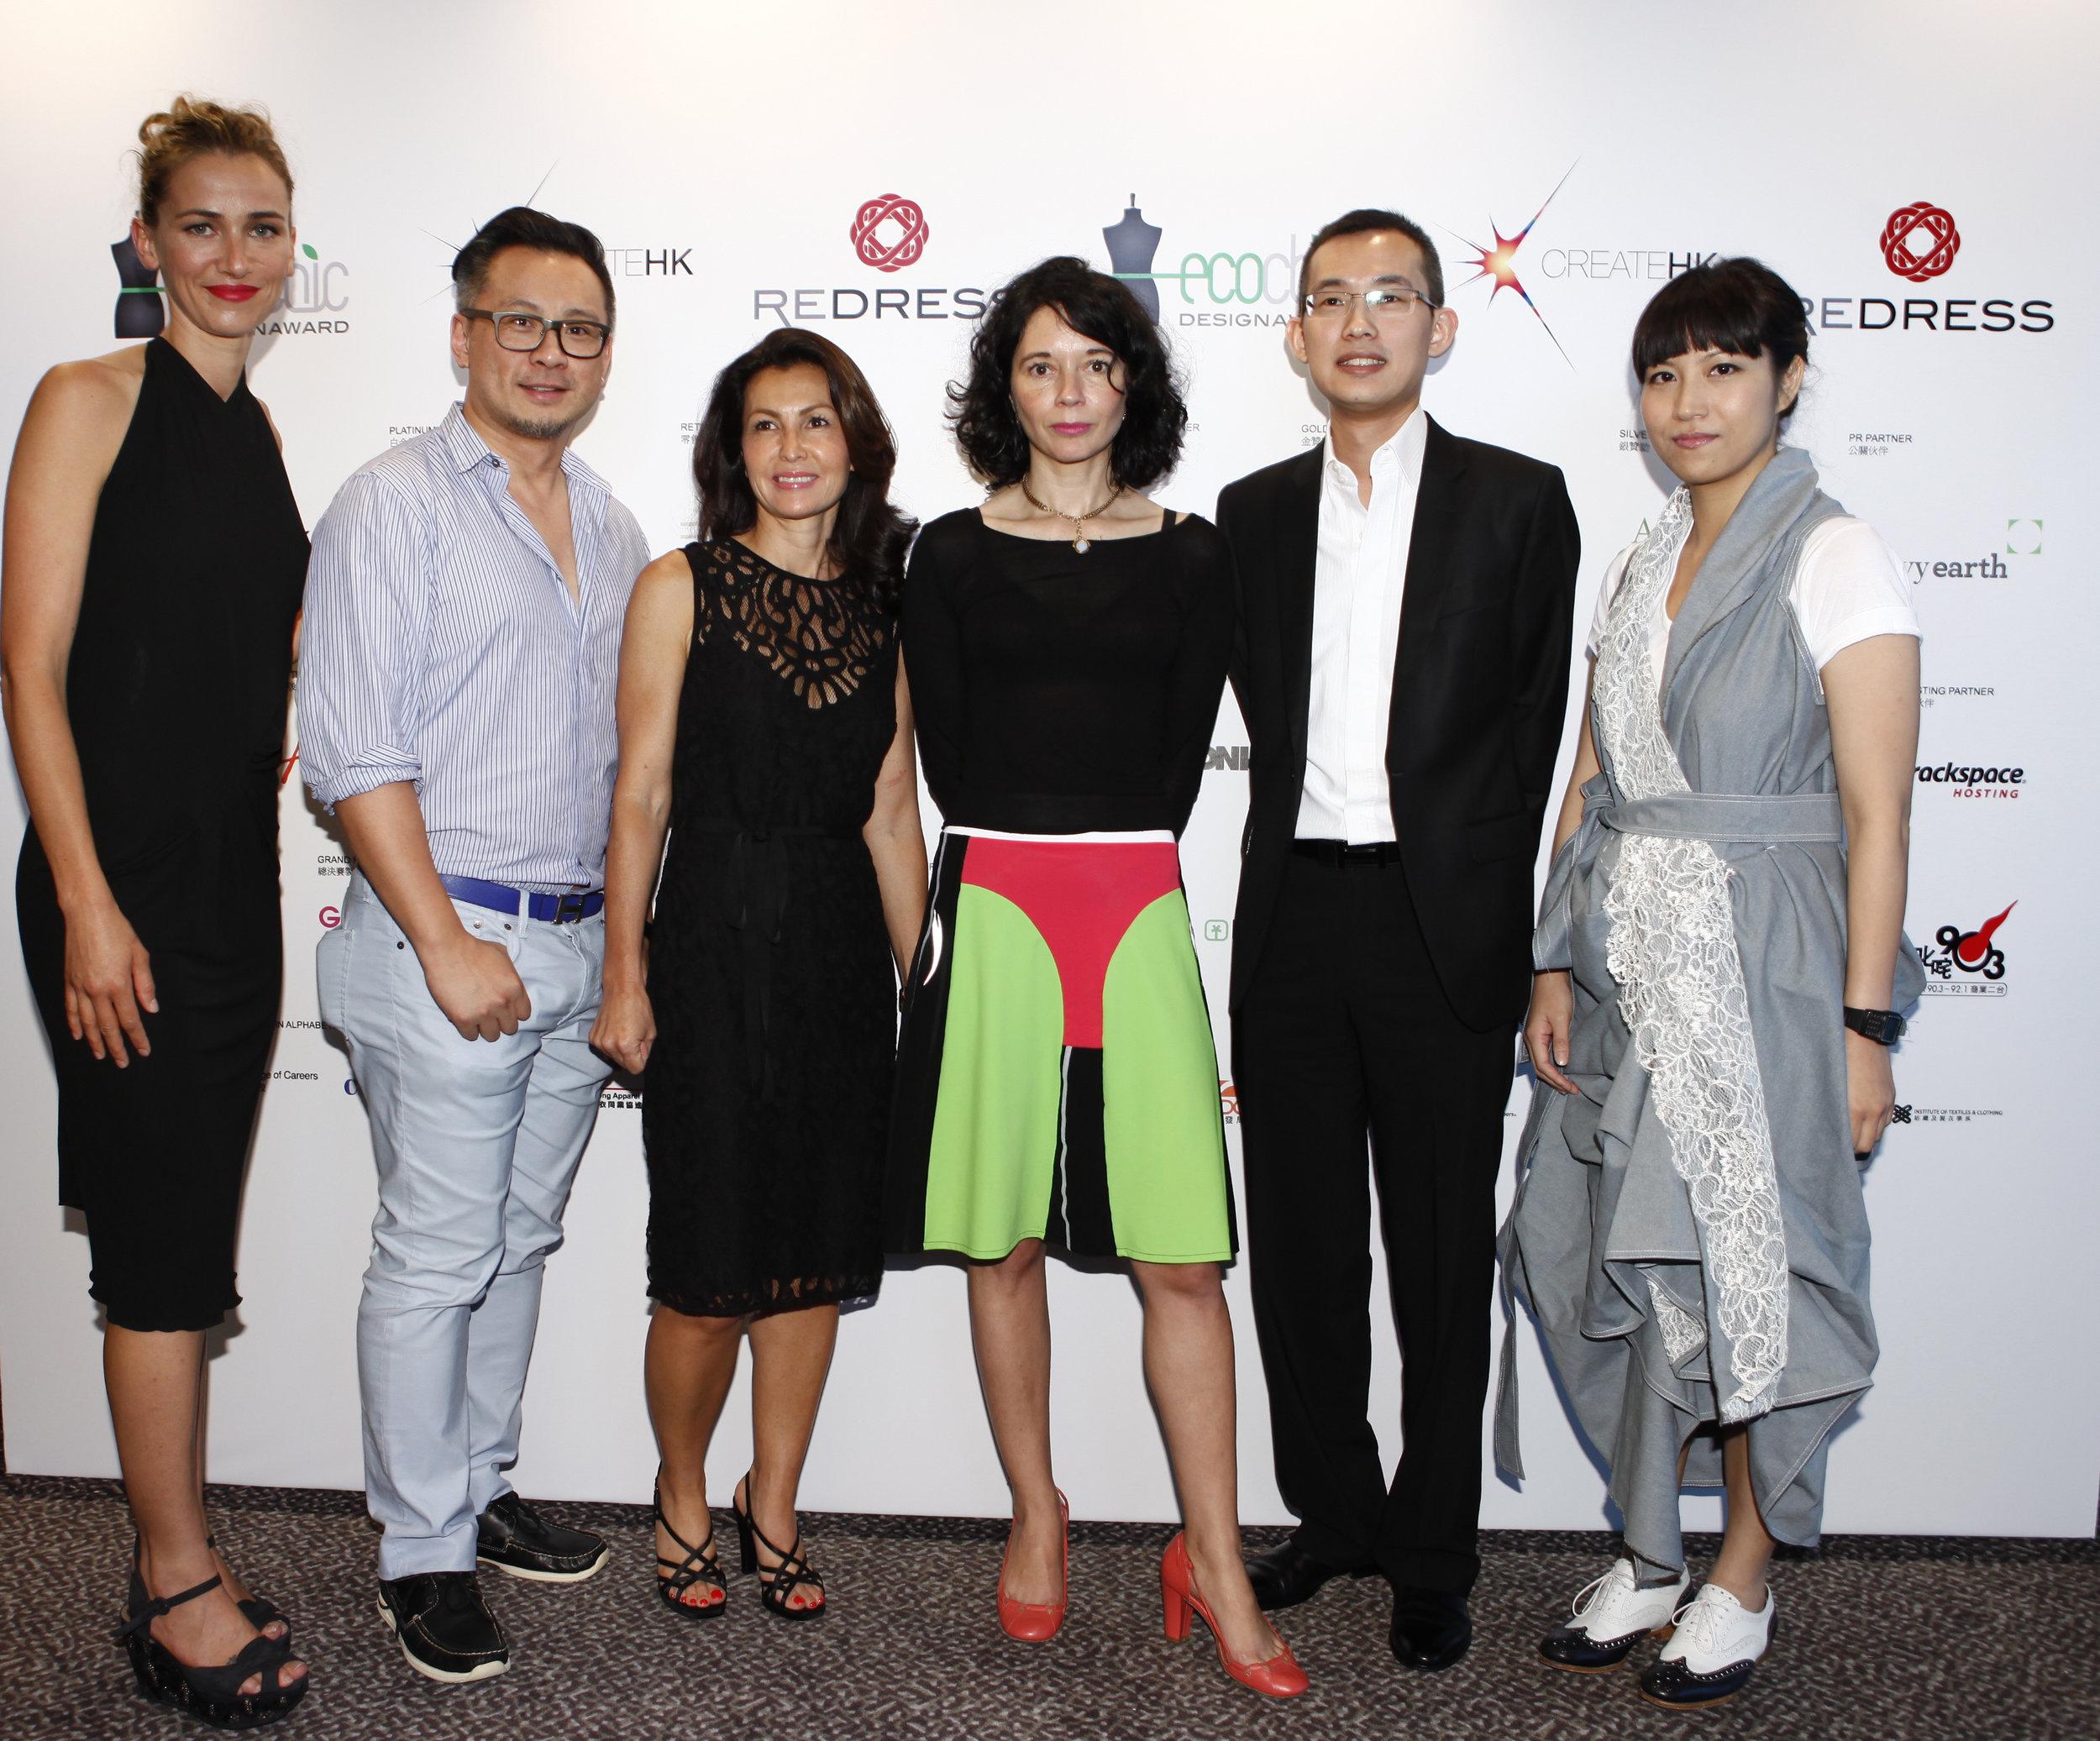 Redress Design Award 2013 judges including Margaret Kutt, Orsola de Castro and Anderson Lee